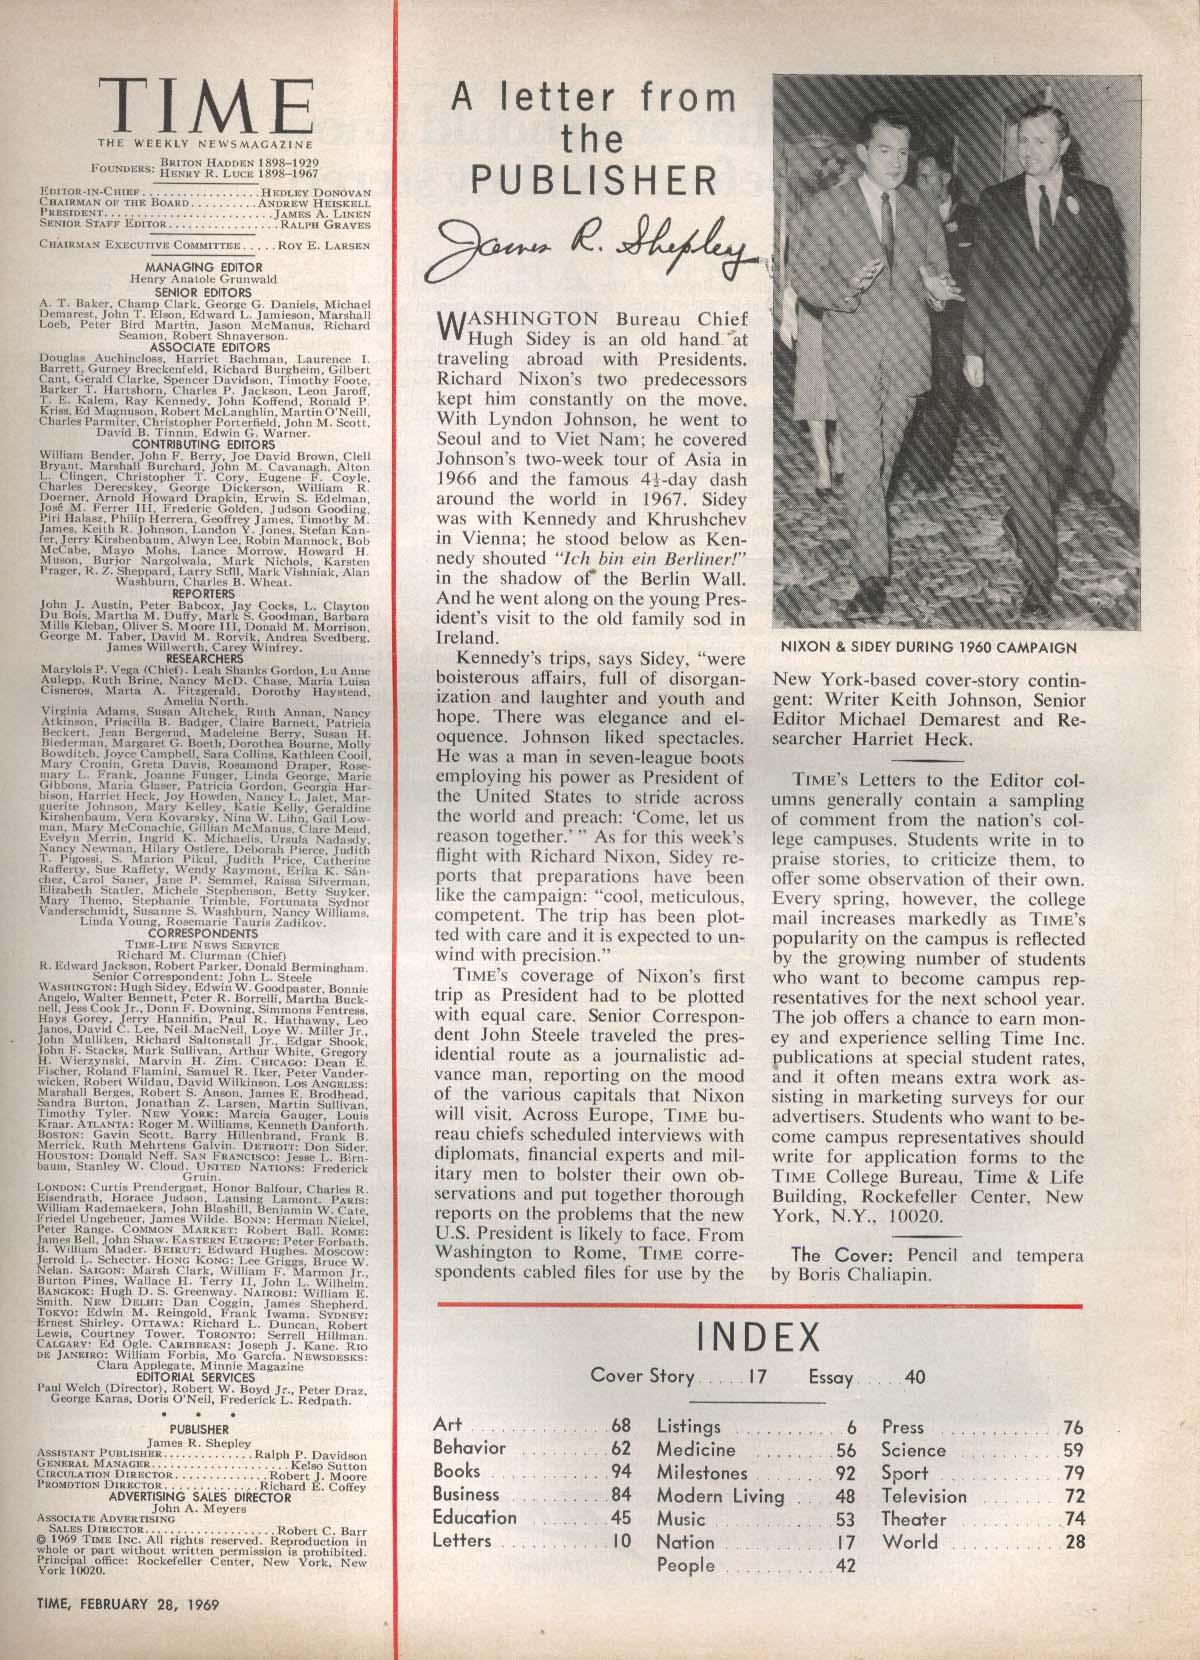 TIME Nixon Black Power Pakistan Ayub Kallia Refugees Israel Occupation 2/28 1969